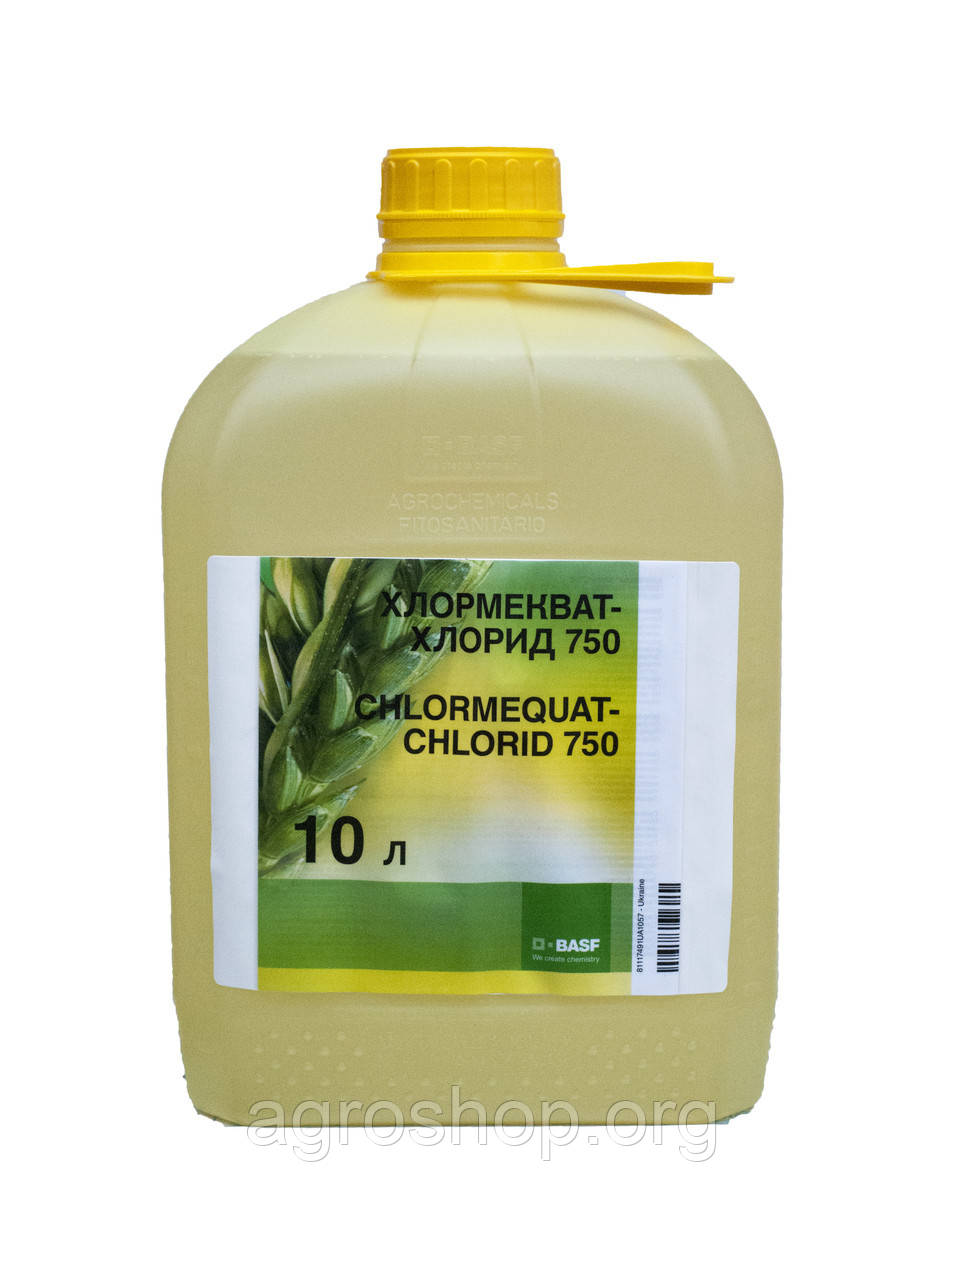 Регулятор росту Хлормекват-хлорид  - 10 л